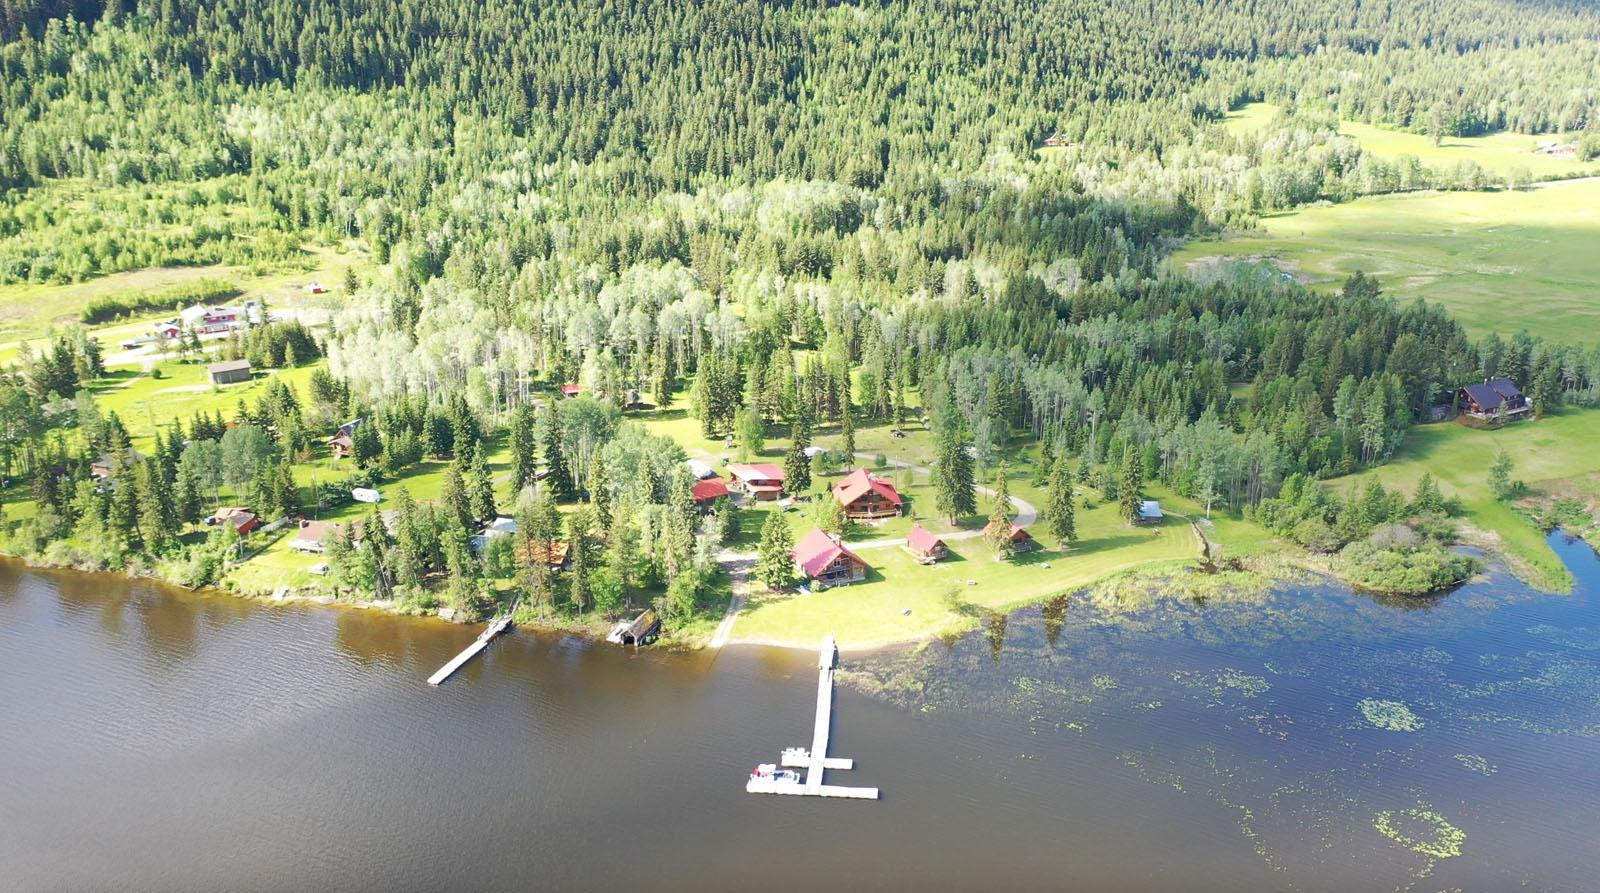 Canim lake resort 02